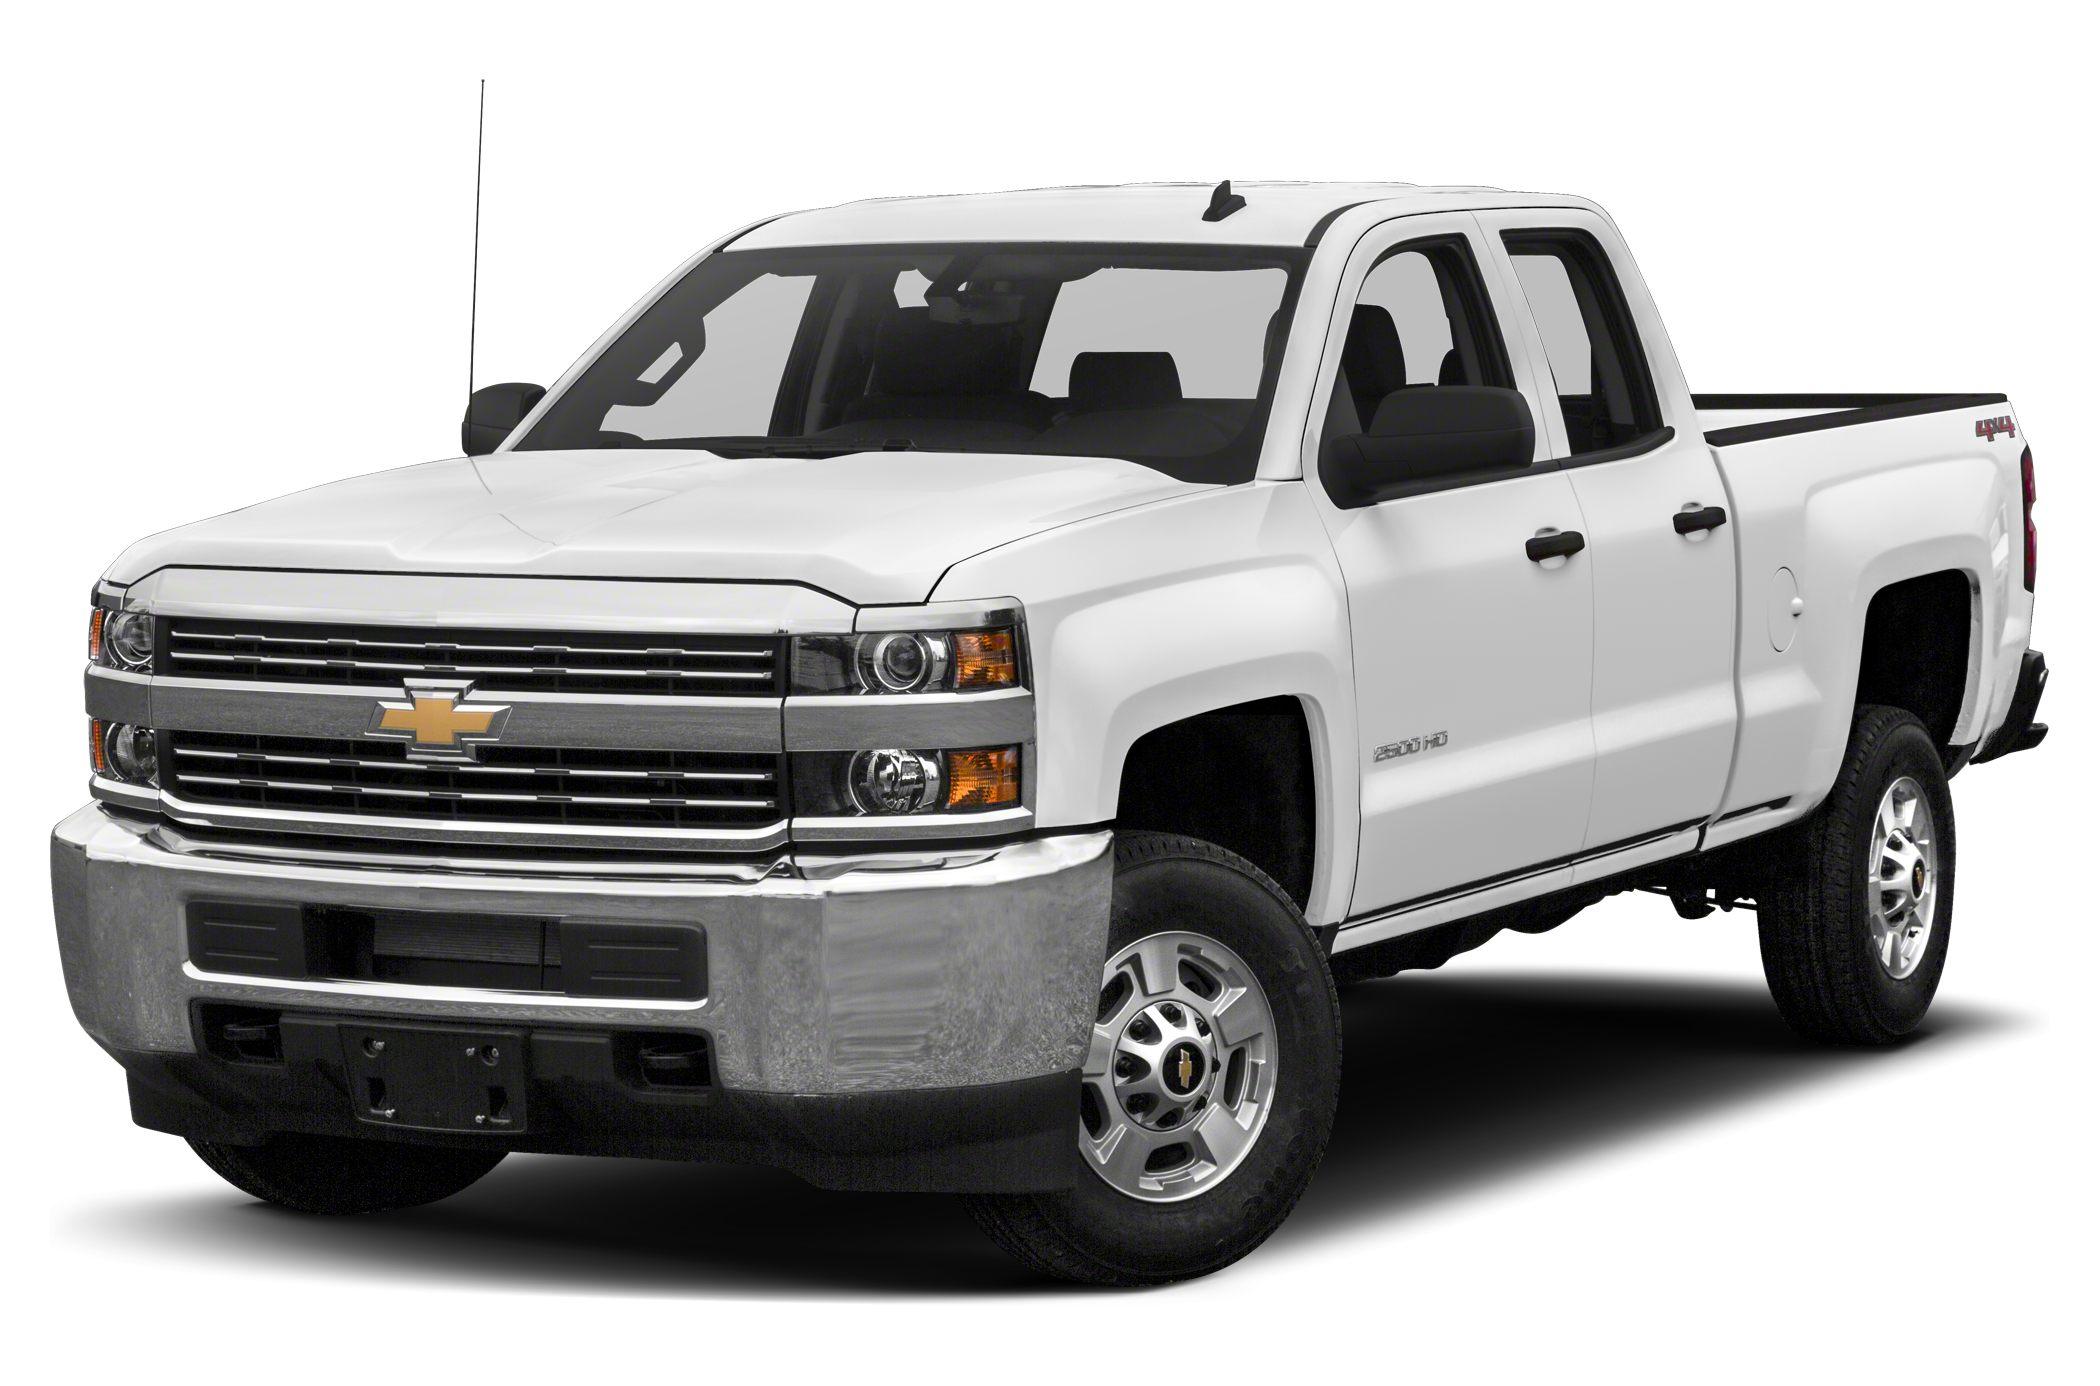 GM recalls 330,000 fullsize trucks for airbag replacement ...